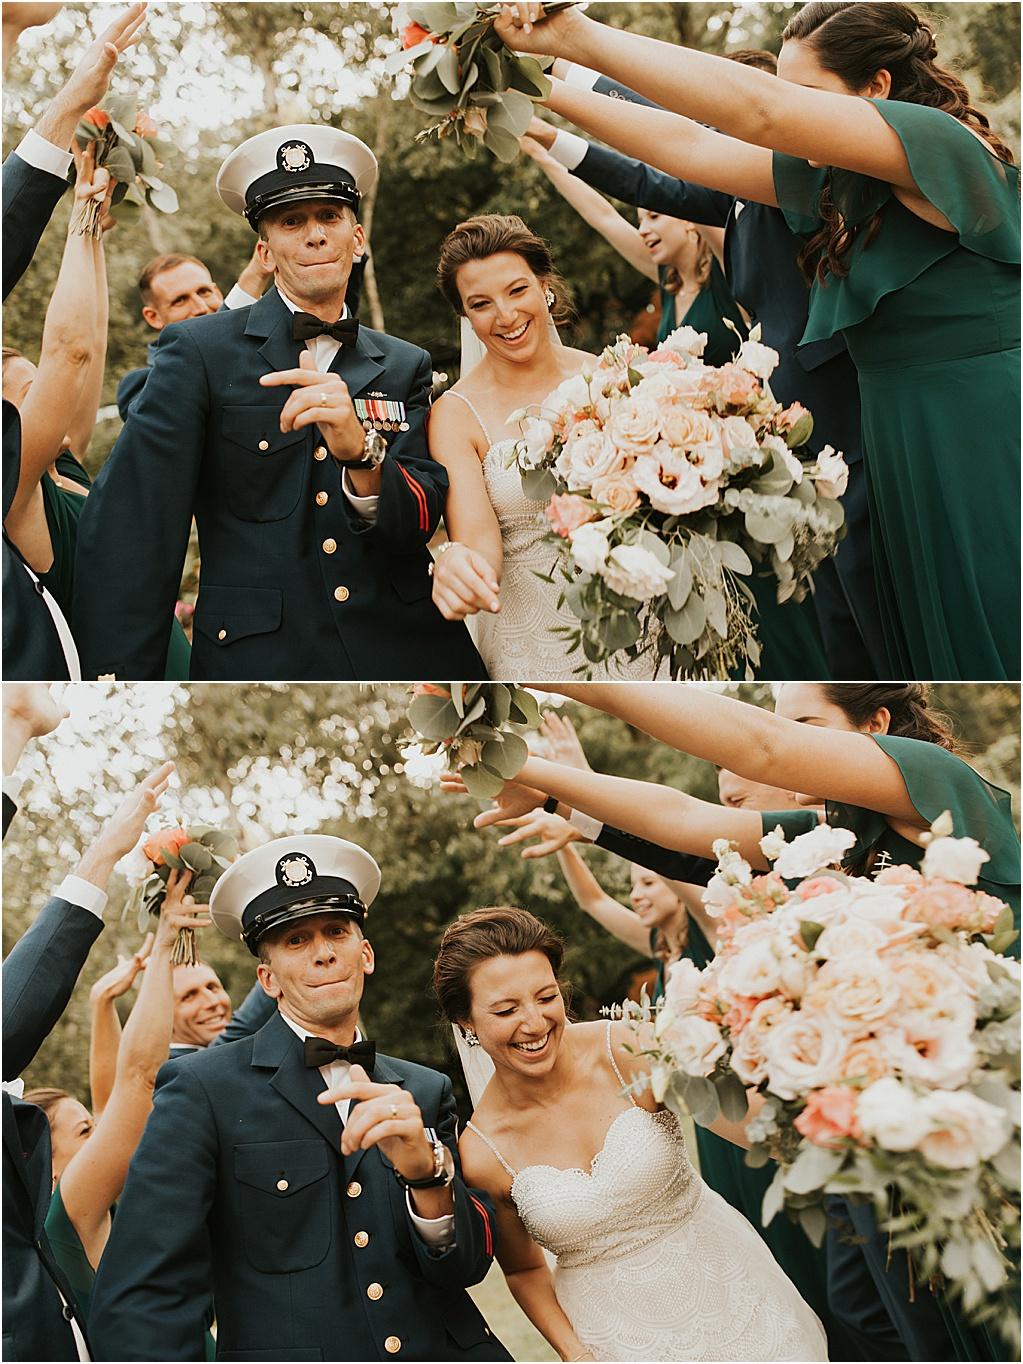 brittany_boote_pennsylvania_wedding_photographer_0639.jpg